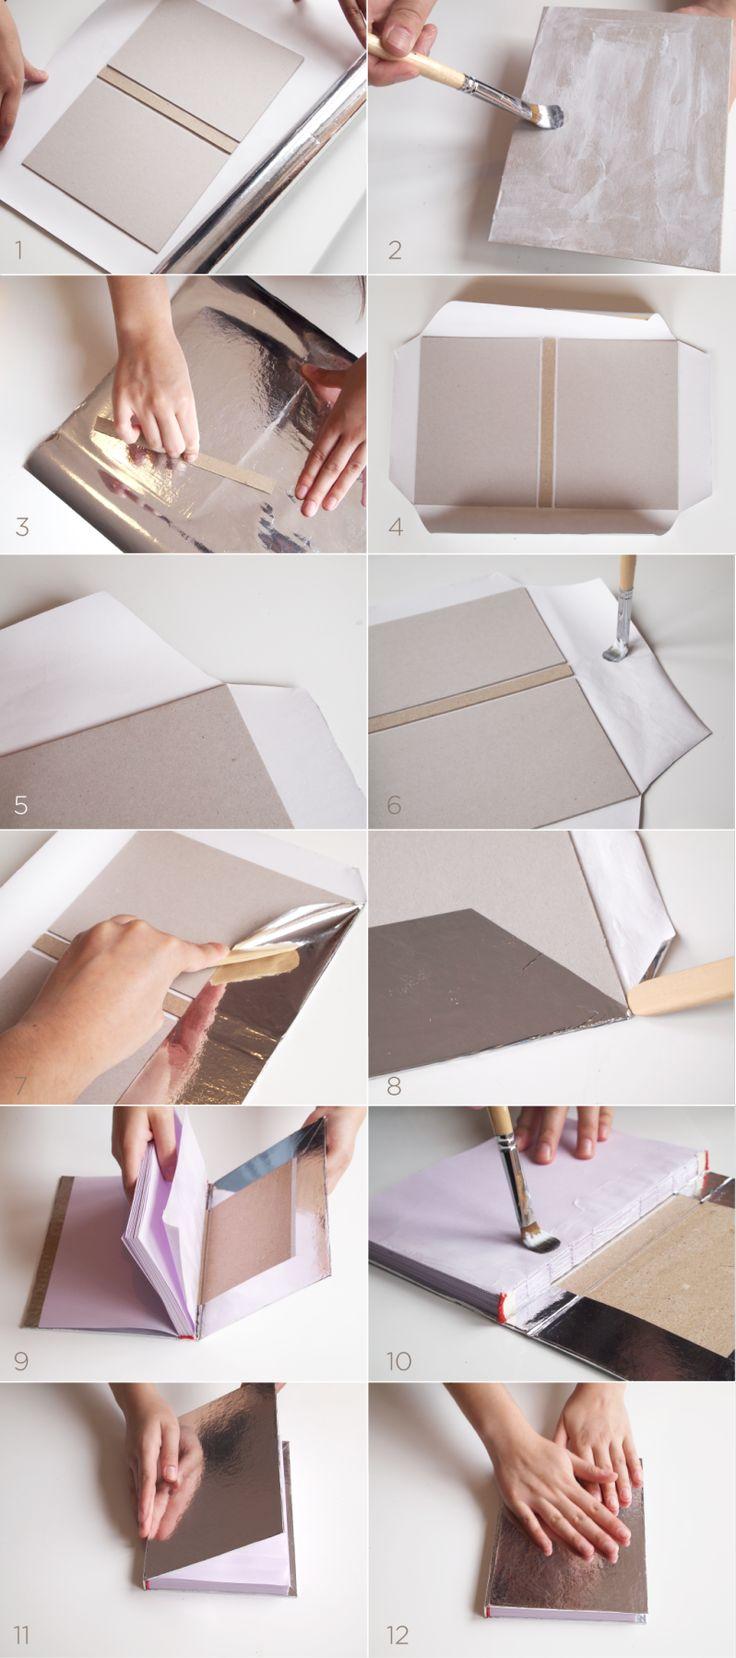 Cuaderno hecho a mano: la tapa dura